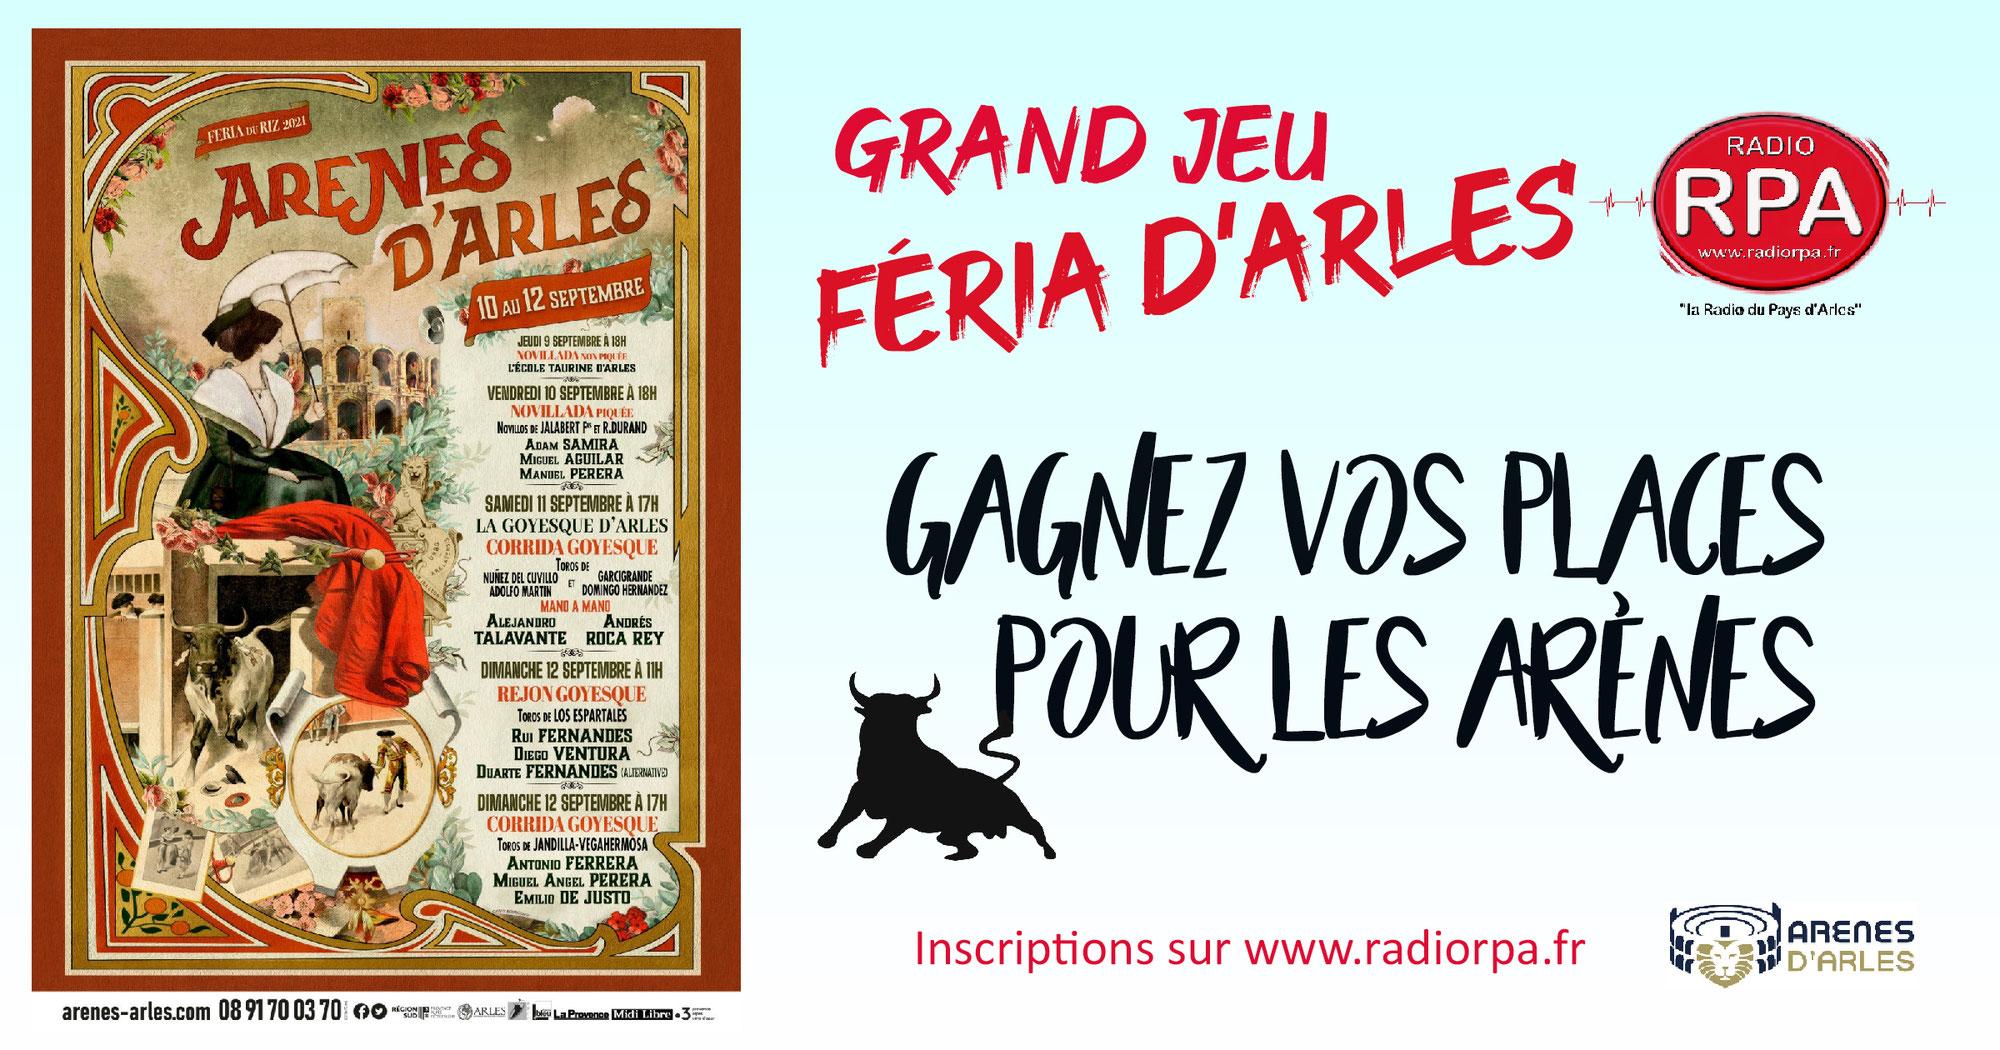 Jeu Radio RPA - Feria du riz Arles 2021